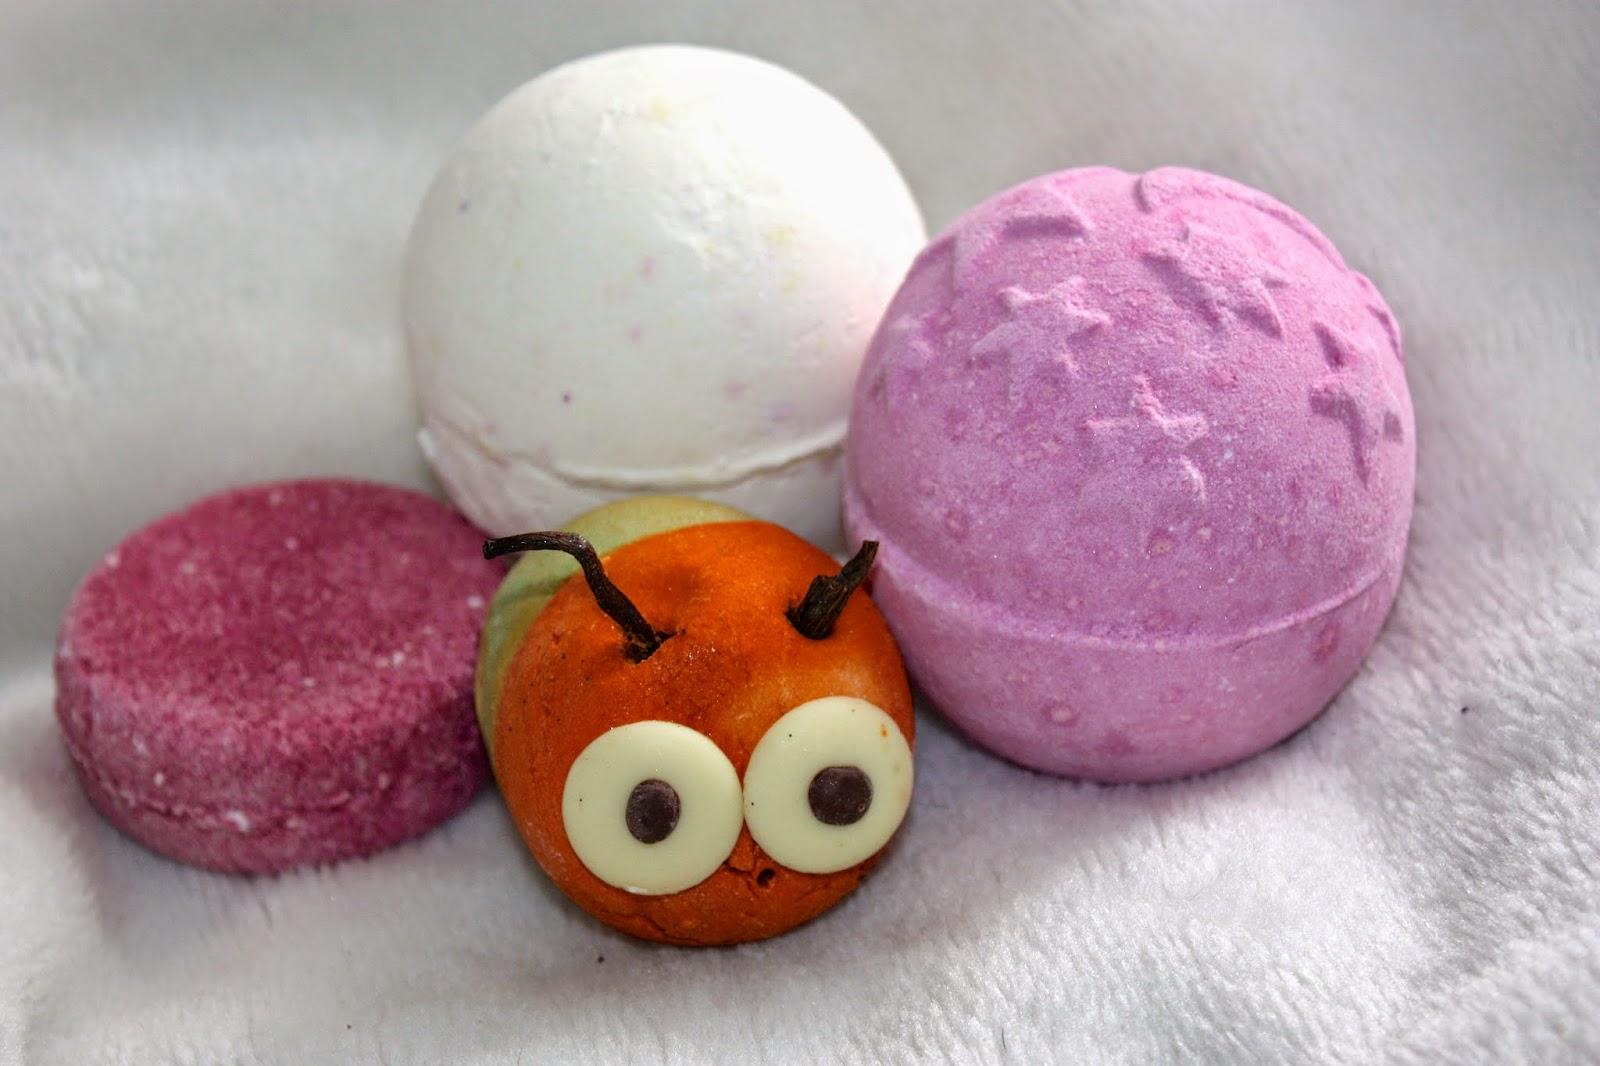 lush bathbomb, bubbleroon, bubble bar, shampoo bar, argan oil, jason, twilight, bubble grub, dragons egg